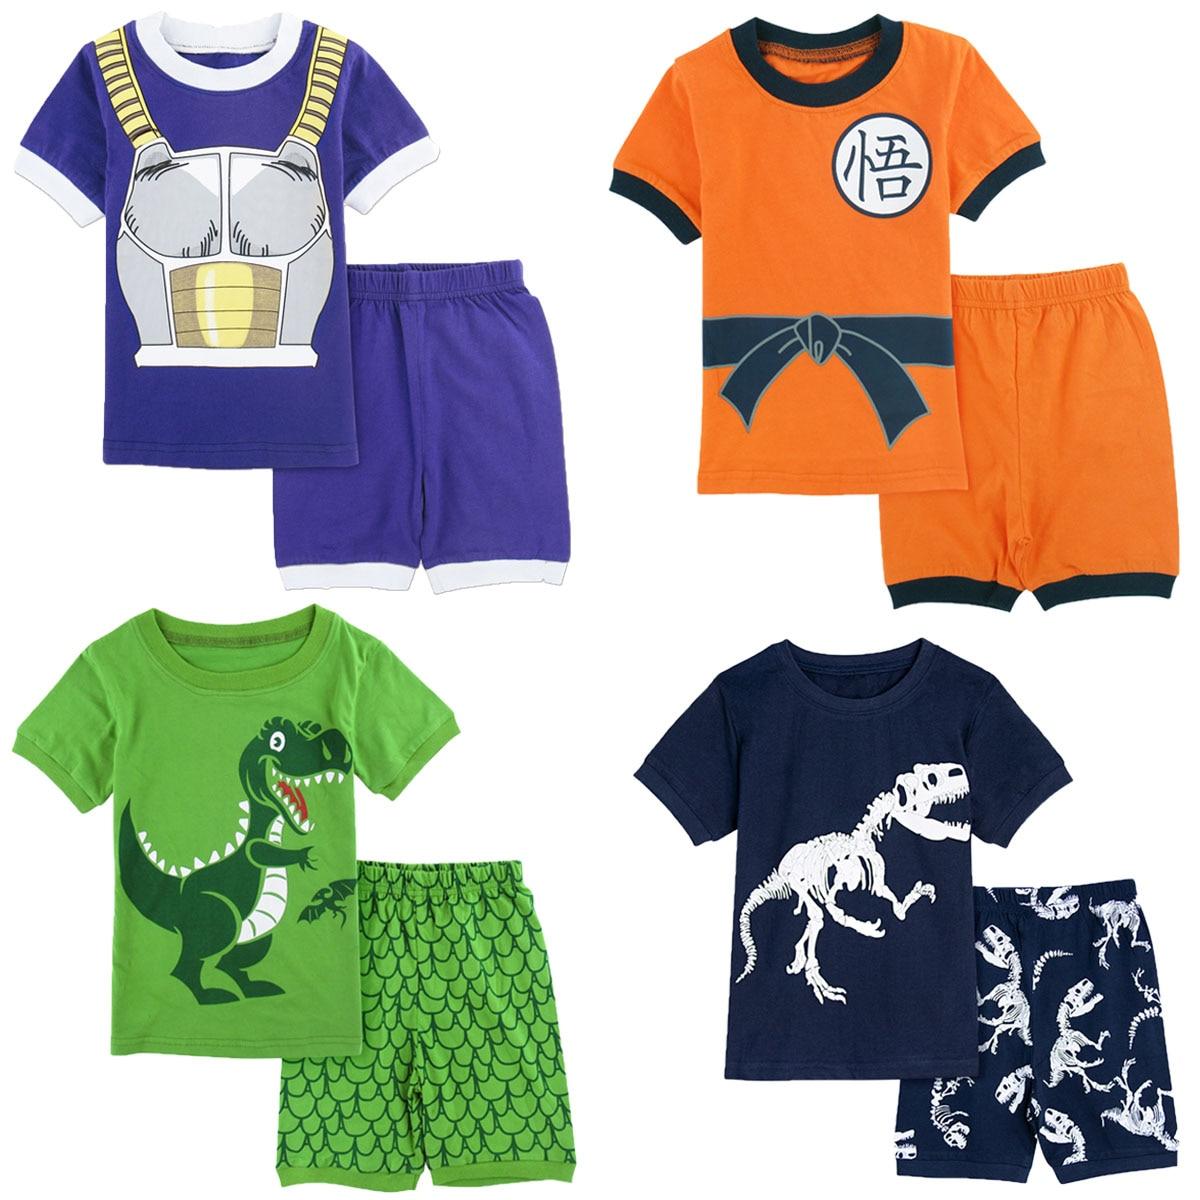 Children's Pajamas Kids Boys Dinosaur Football Sleepwear Set Toddler Pirate Soccer Cartoon Sport Nightwear Child Summer Pjs